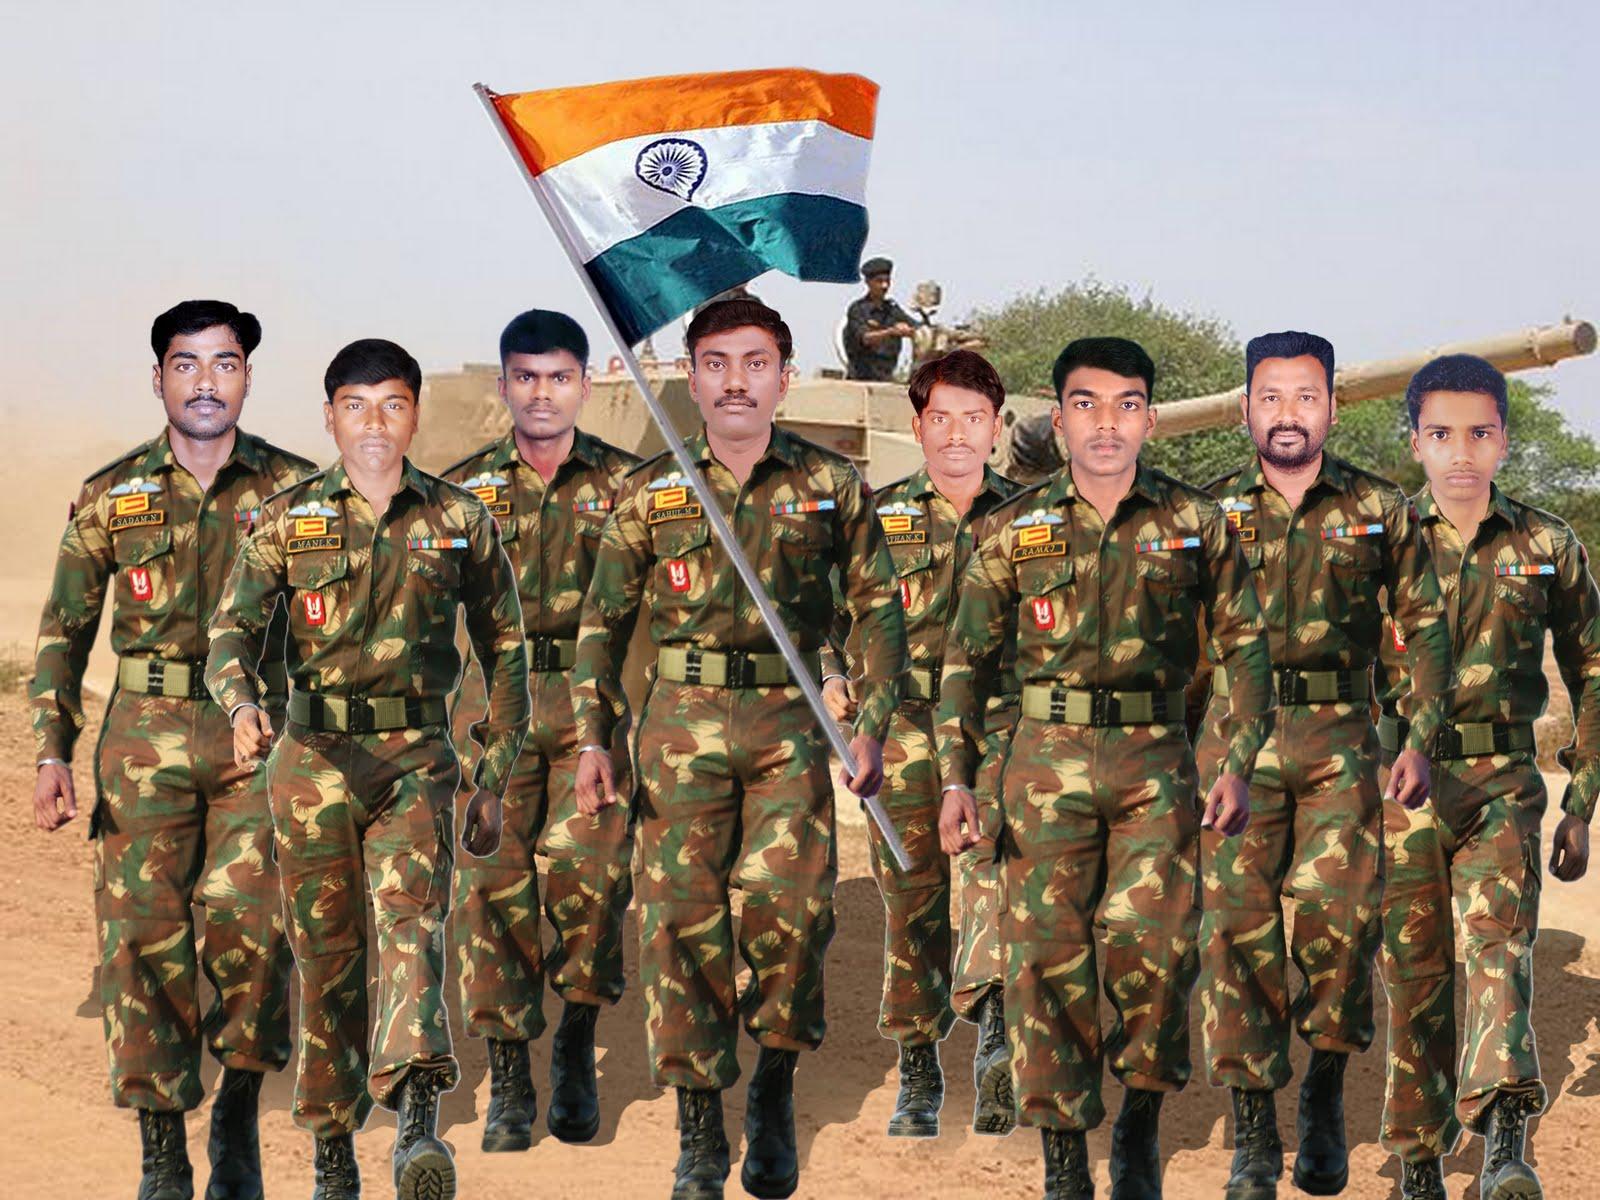 Indian Army Photos Hd 1600x1200 Wallpaper Teahub Io